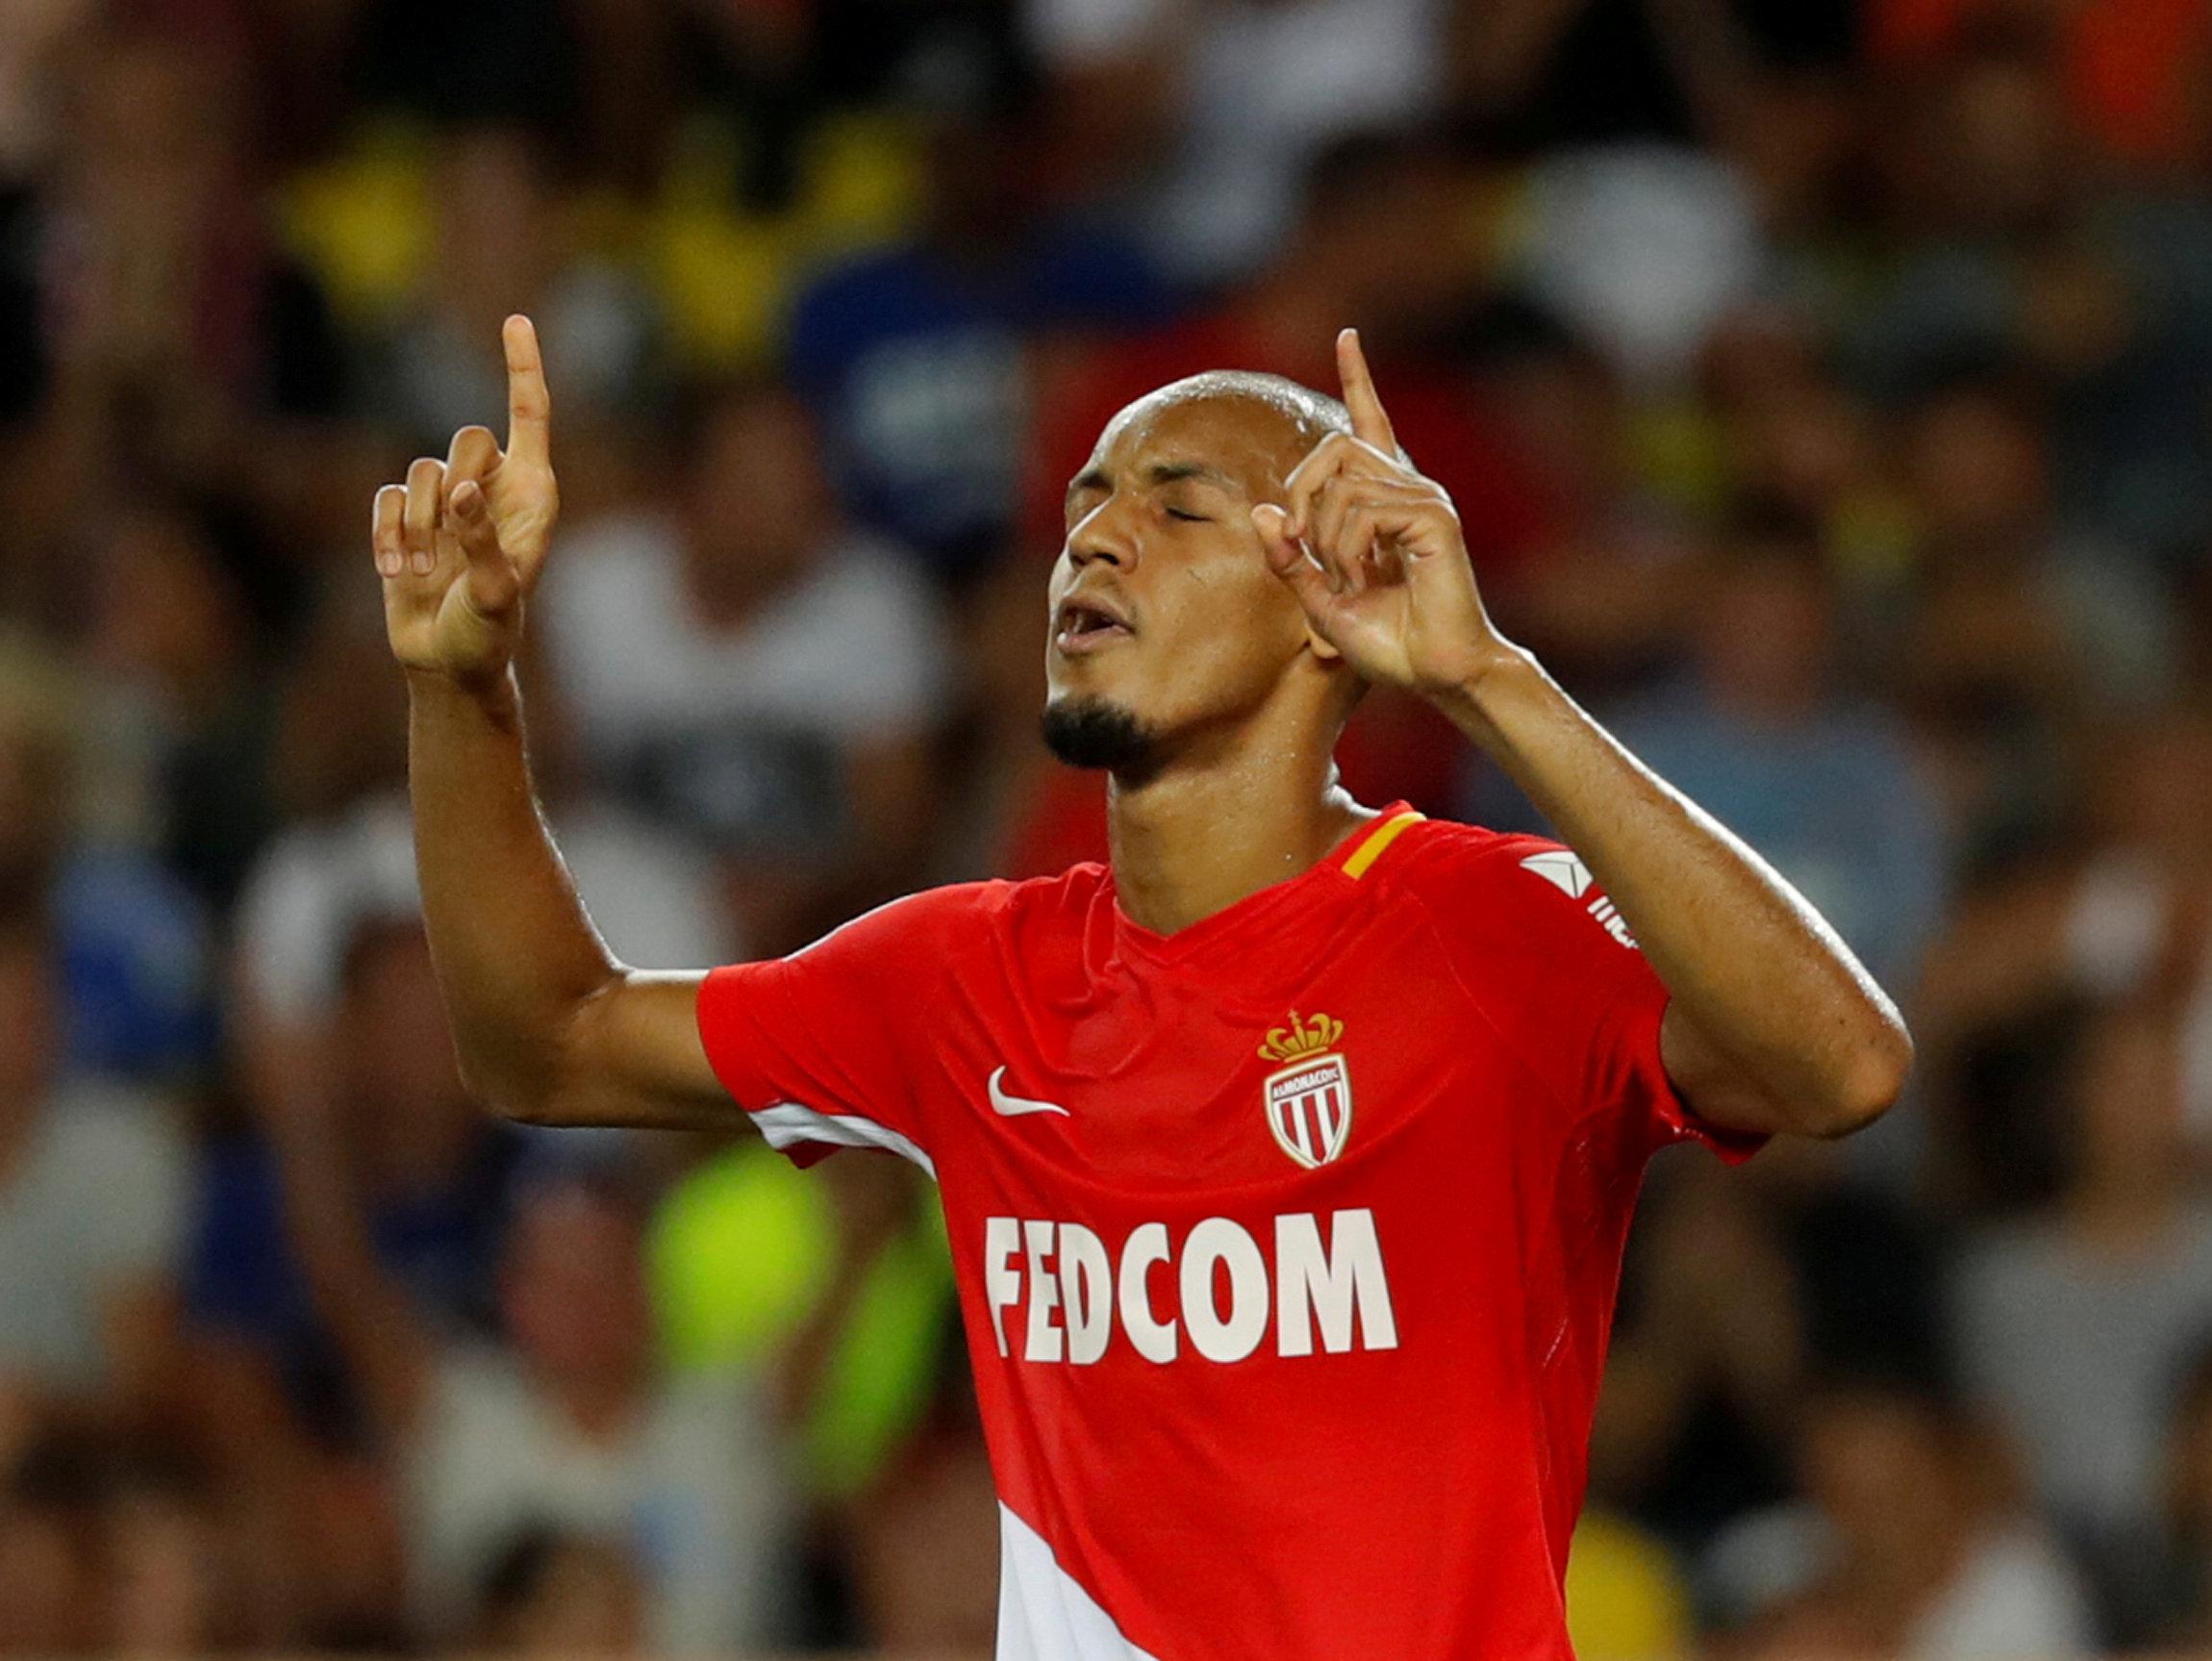 Football: Liverpool to sign Brazilian Fabinho